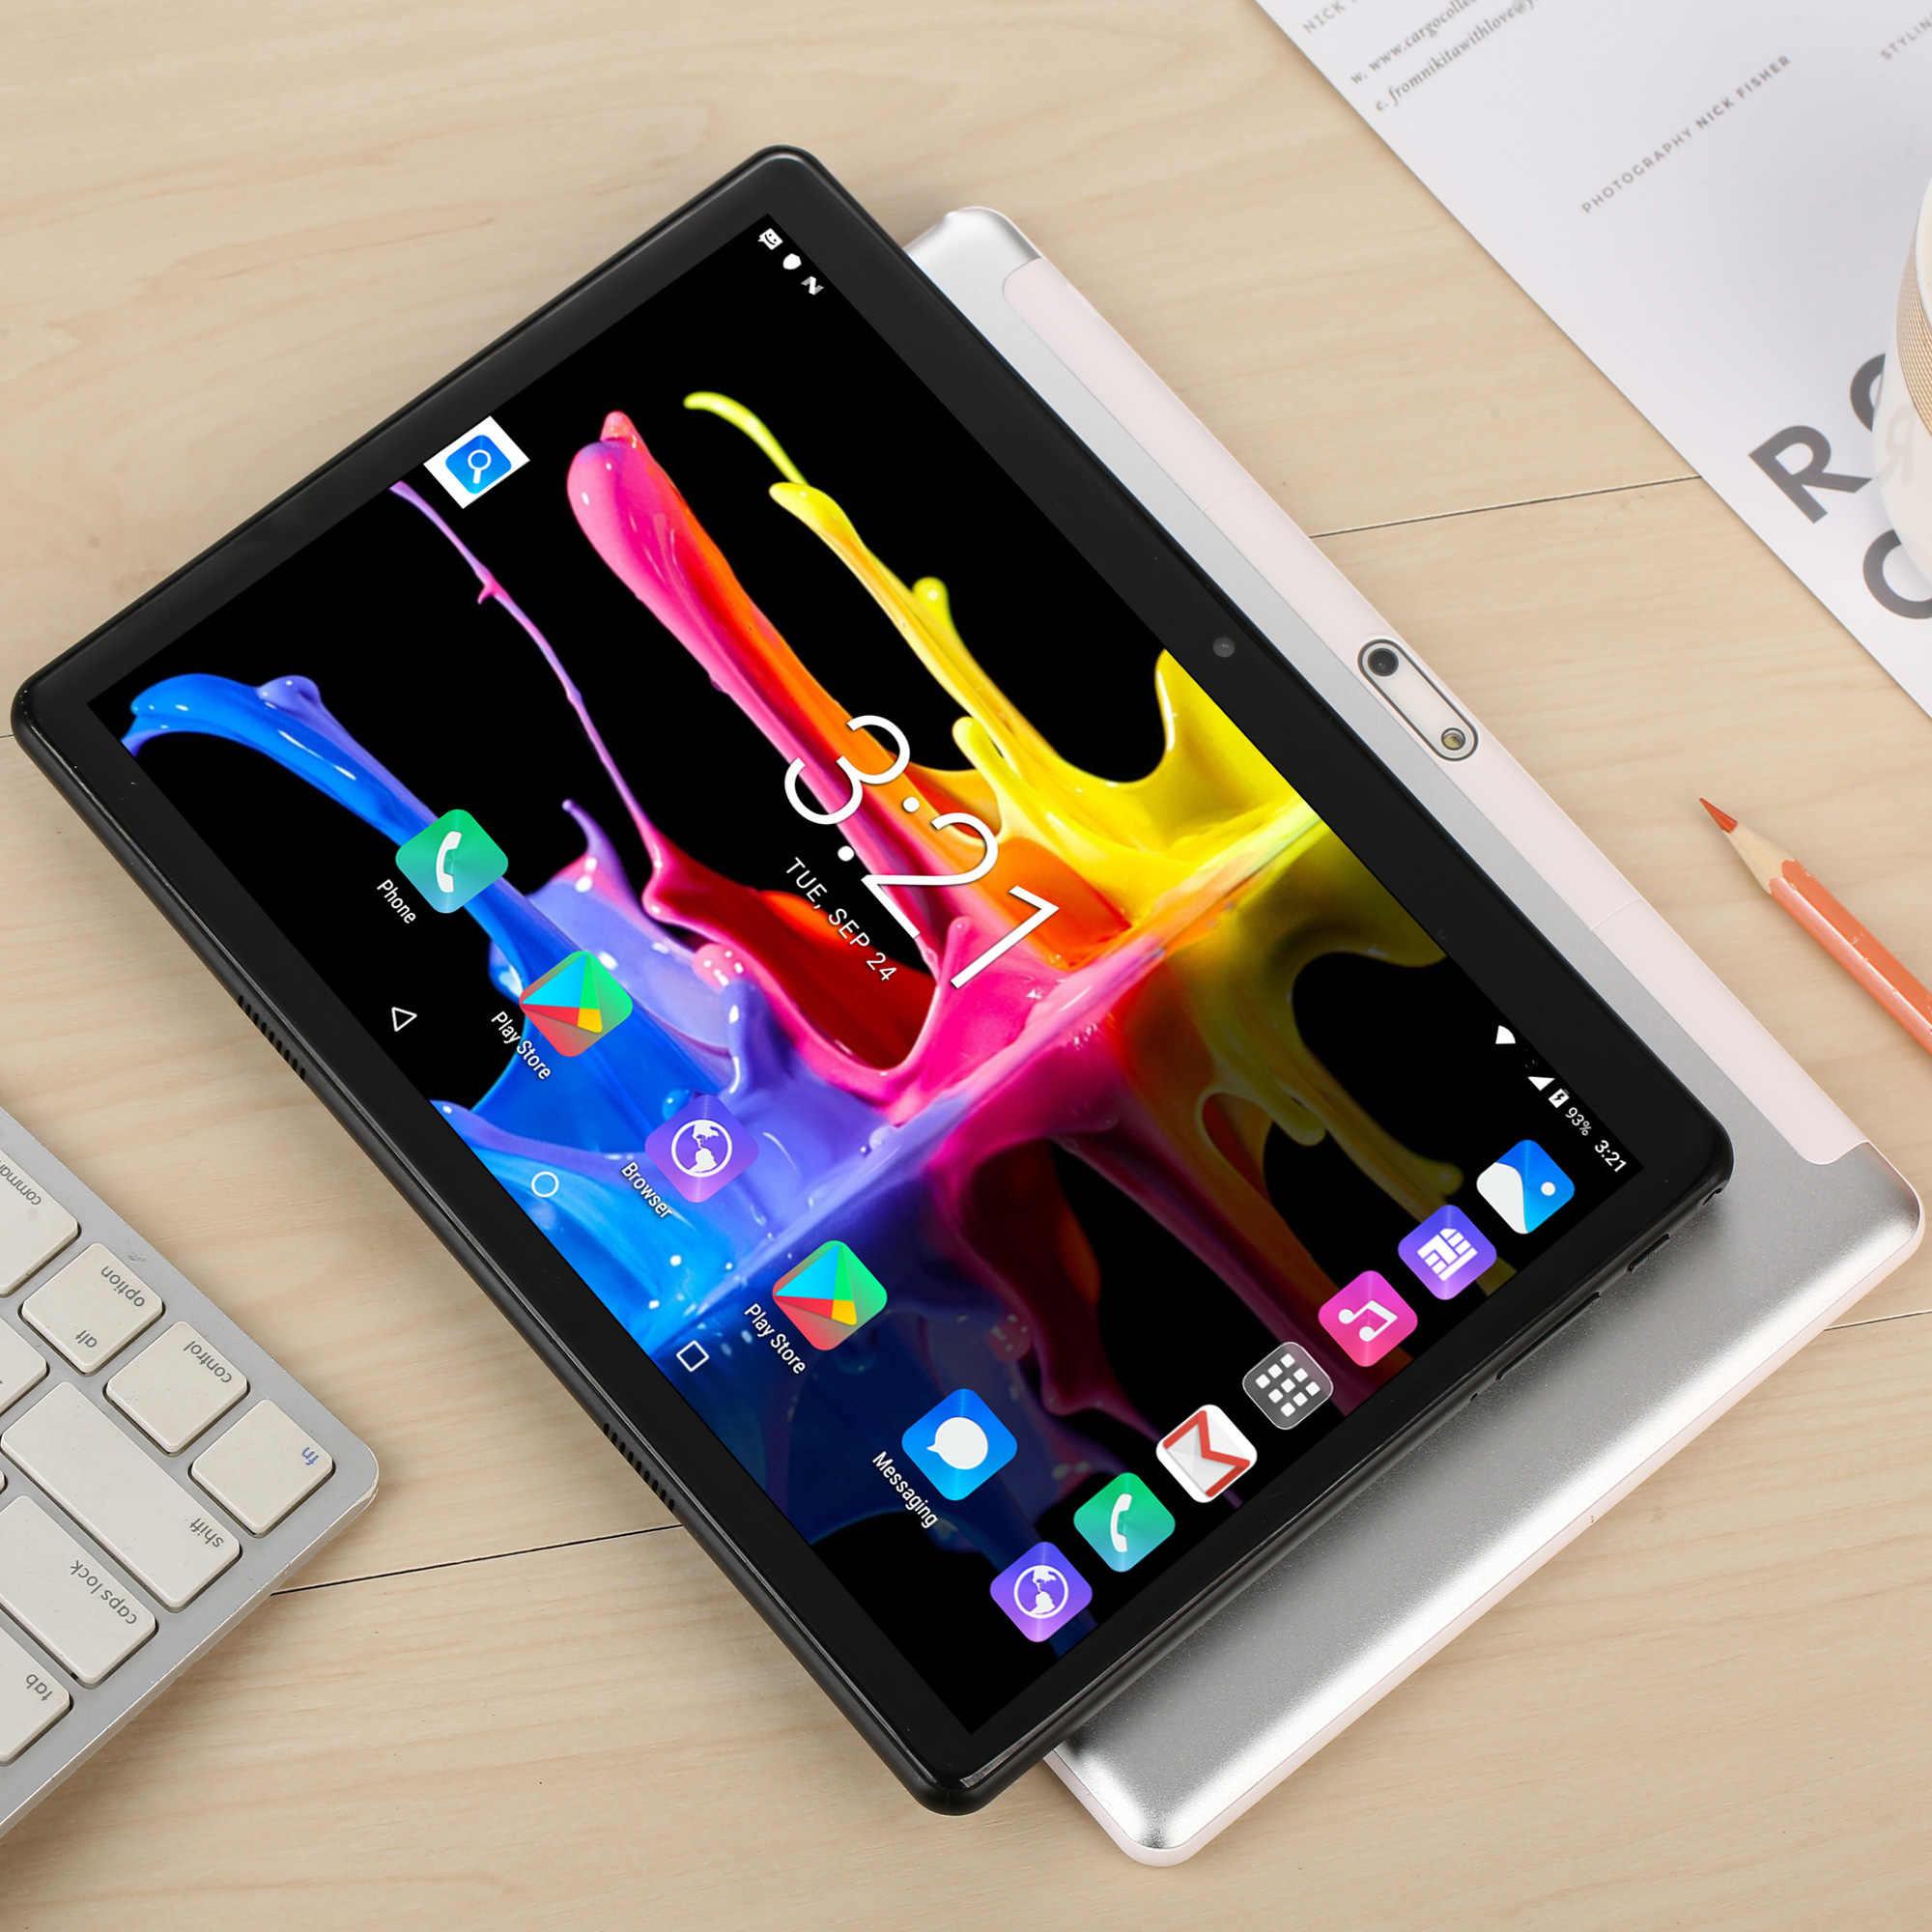 2020 yeni Tablet Pc 10.1 inç Android 7.0 Google 3G telefon görüşmesi Tablet WiFi Bluetooth GPS 2.5D temperli cam 10 inç Tablet